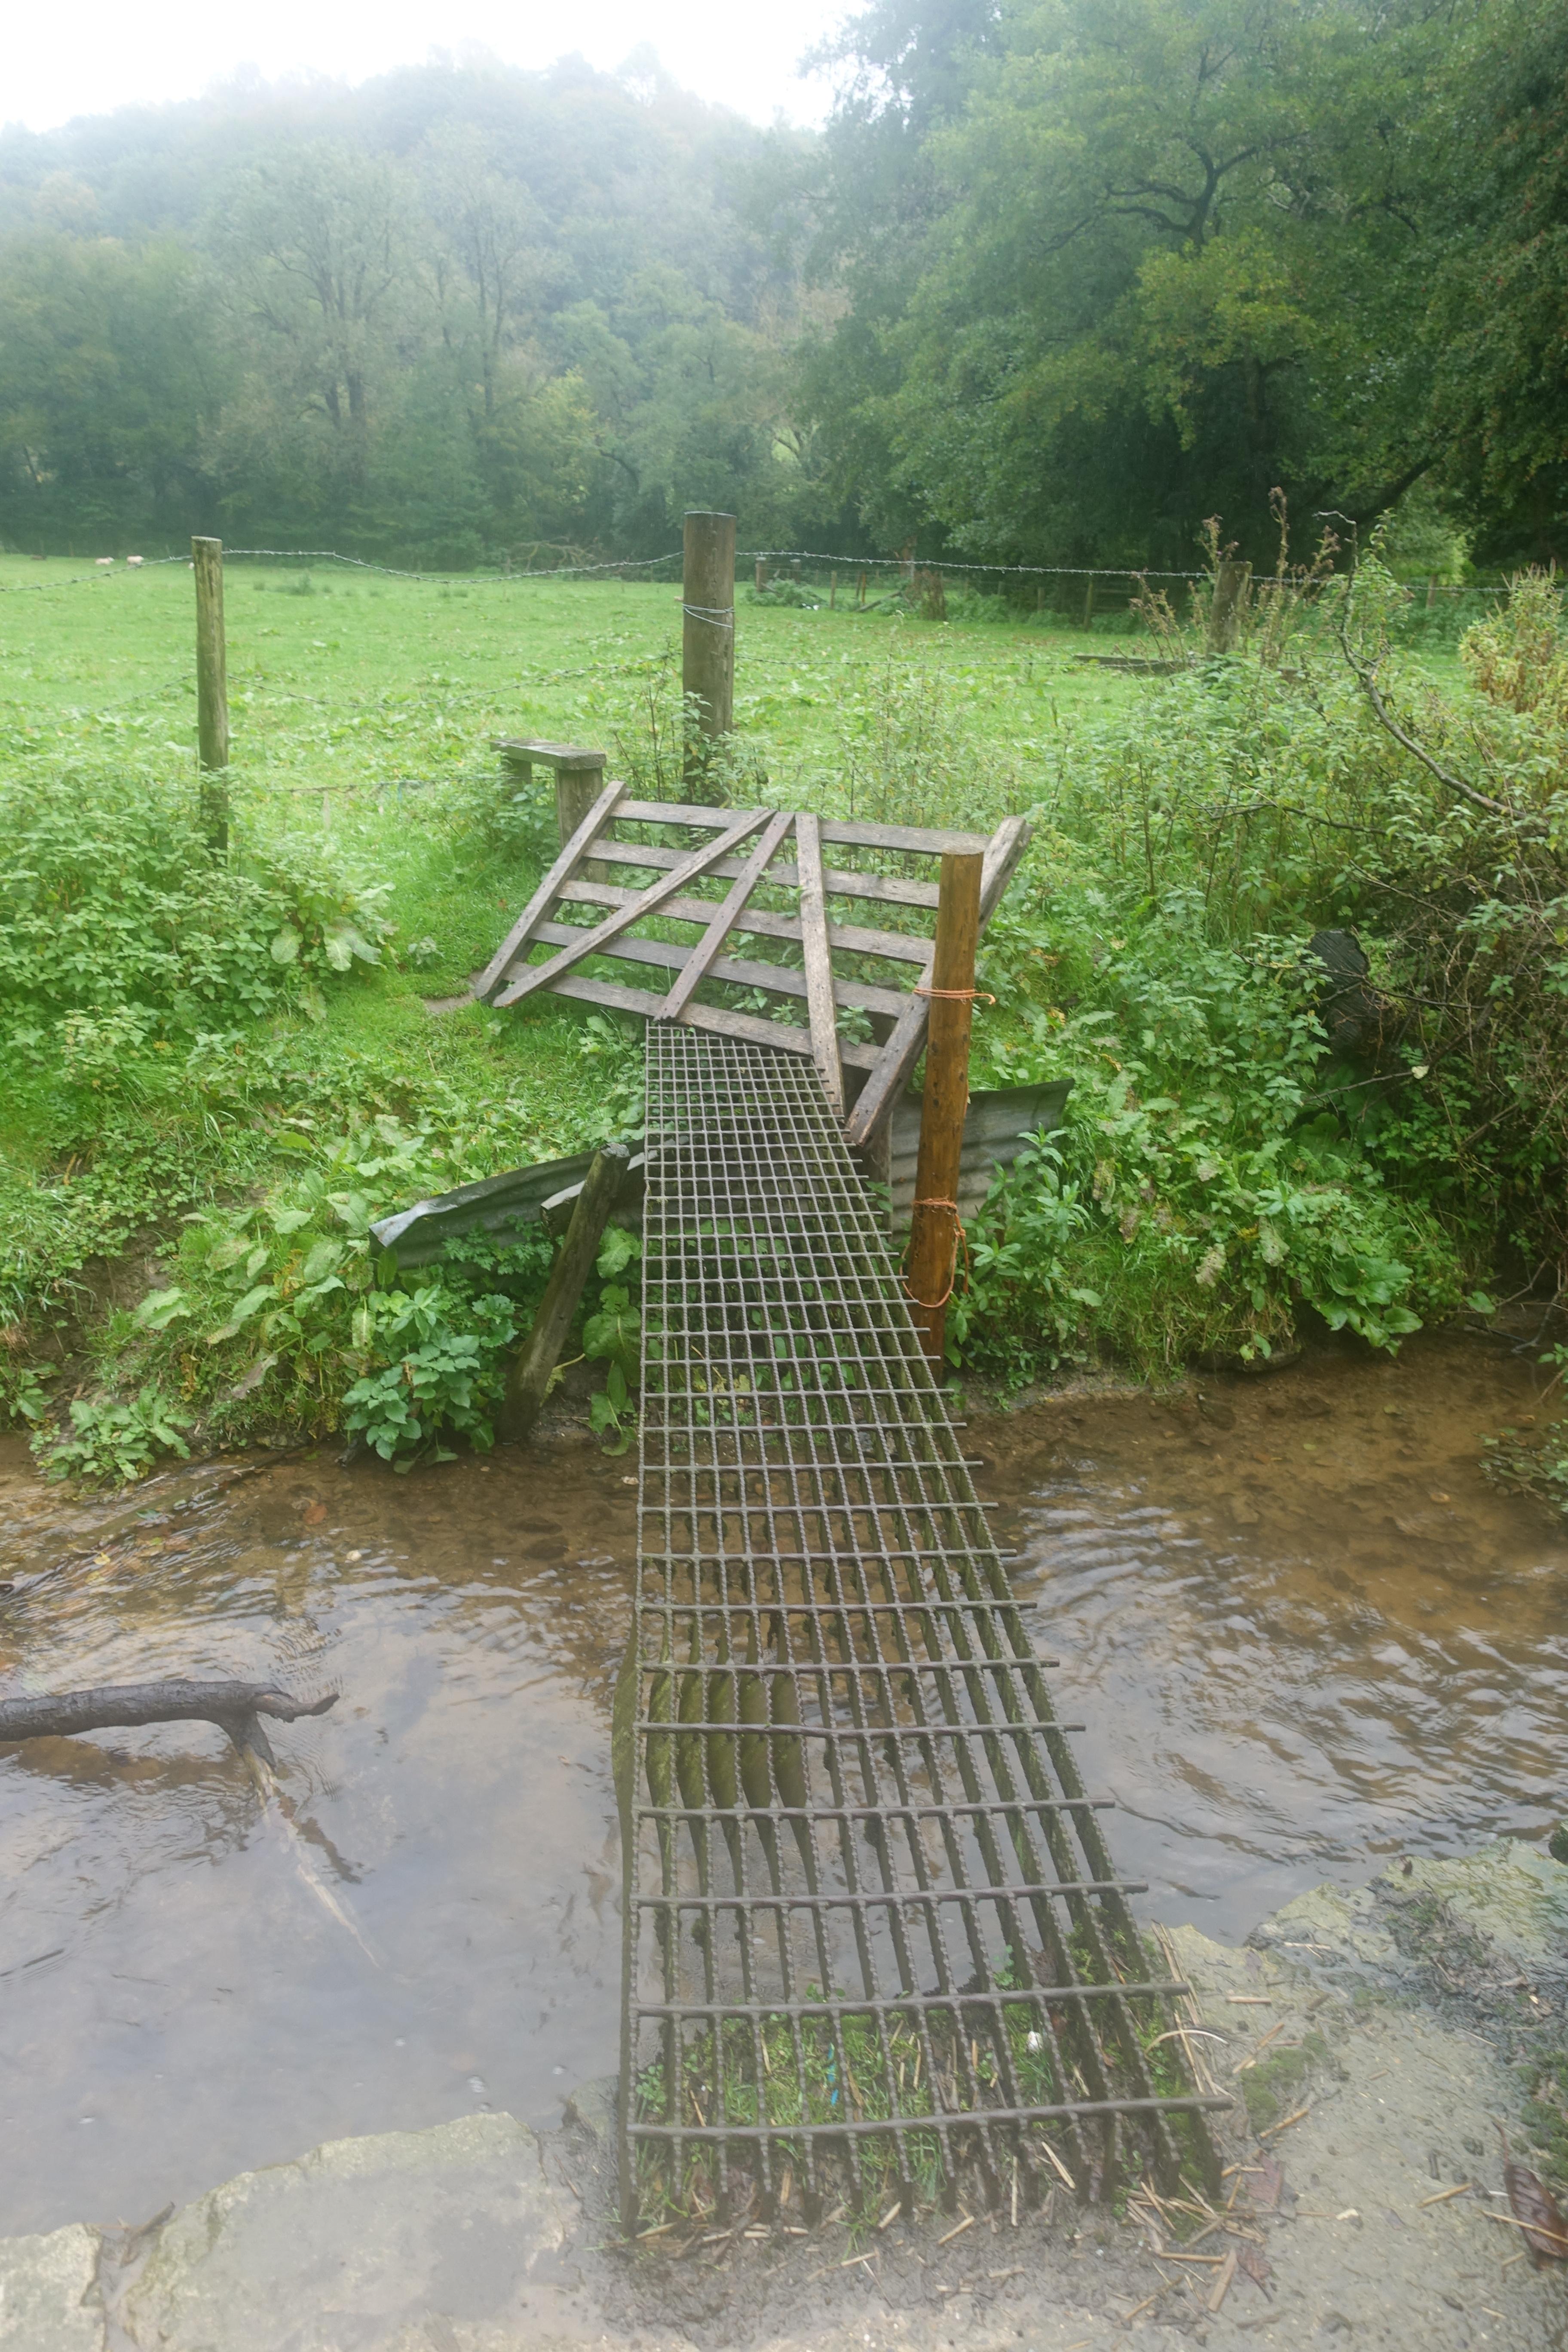 Dodgy bridge takes the hiker into a dodgy farmyard